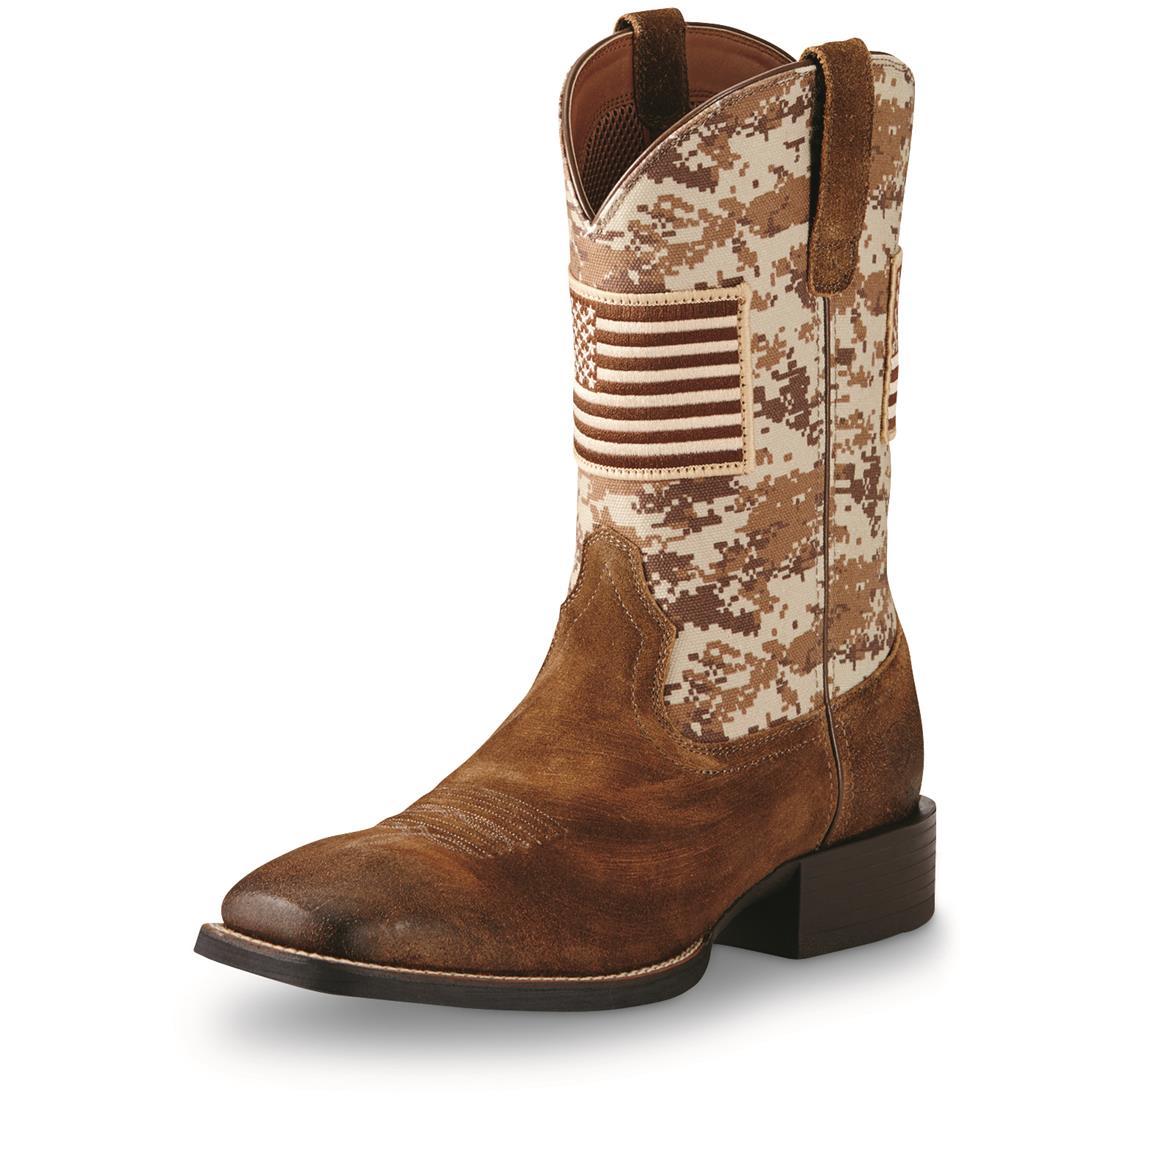 ariat cowboy boots ariat menu0027s sport patriot cowboy boots, mocha suede / sand camo piqwhlt